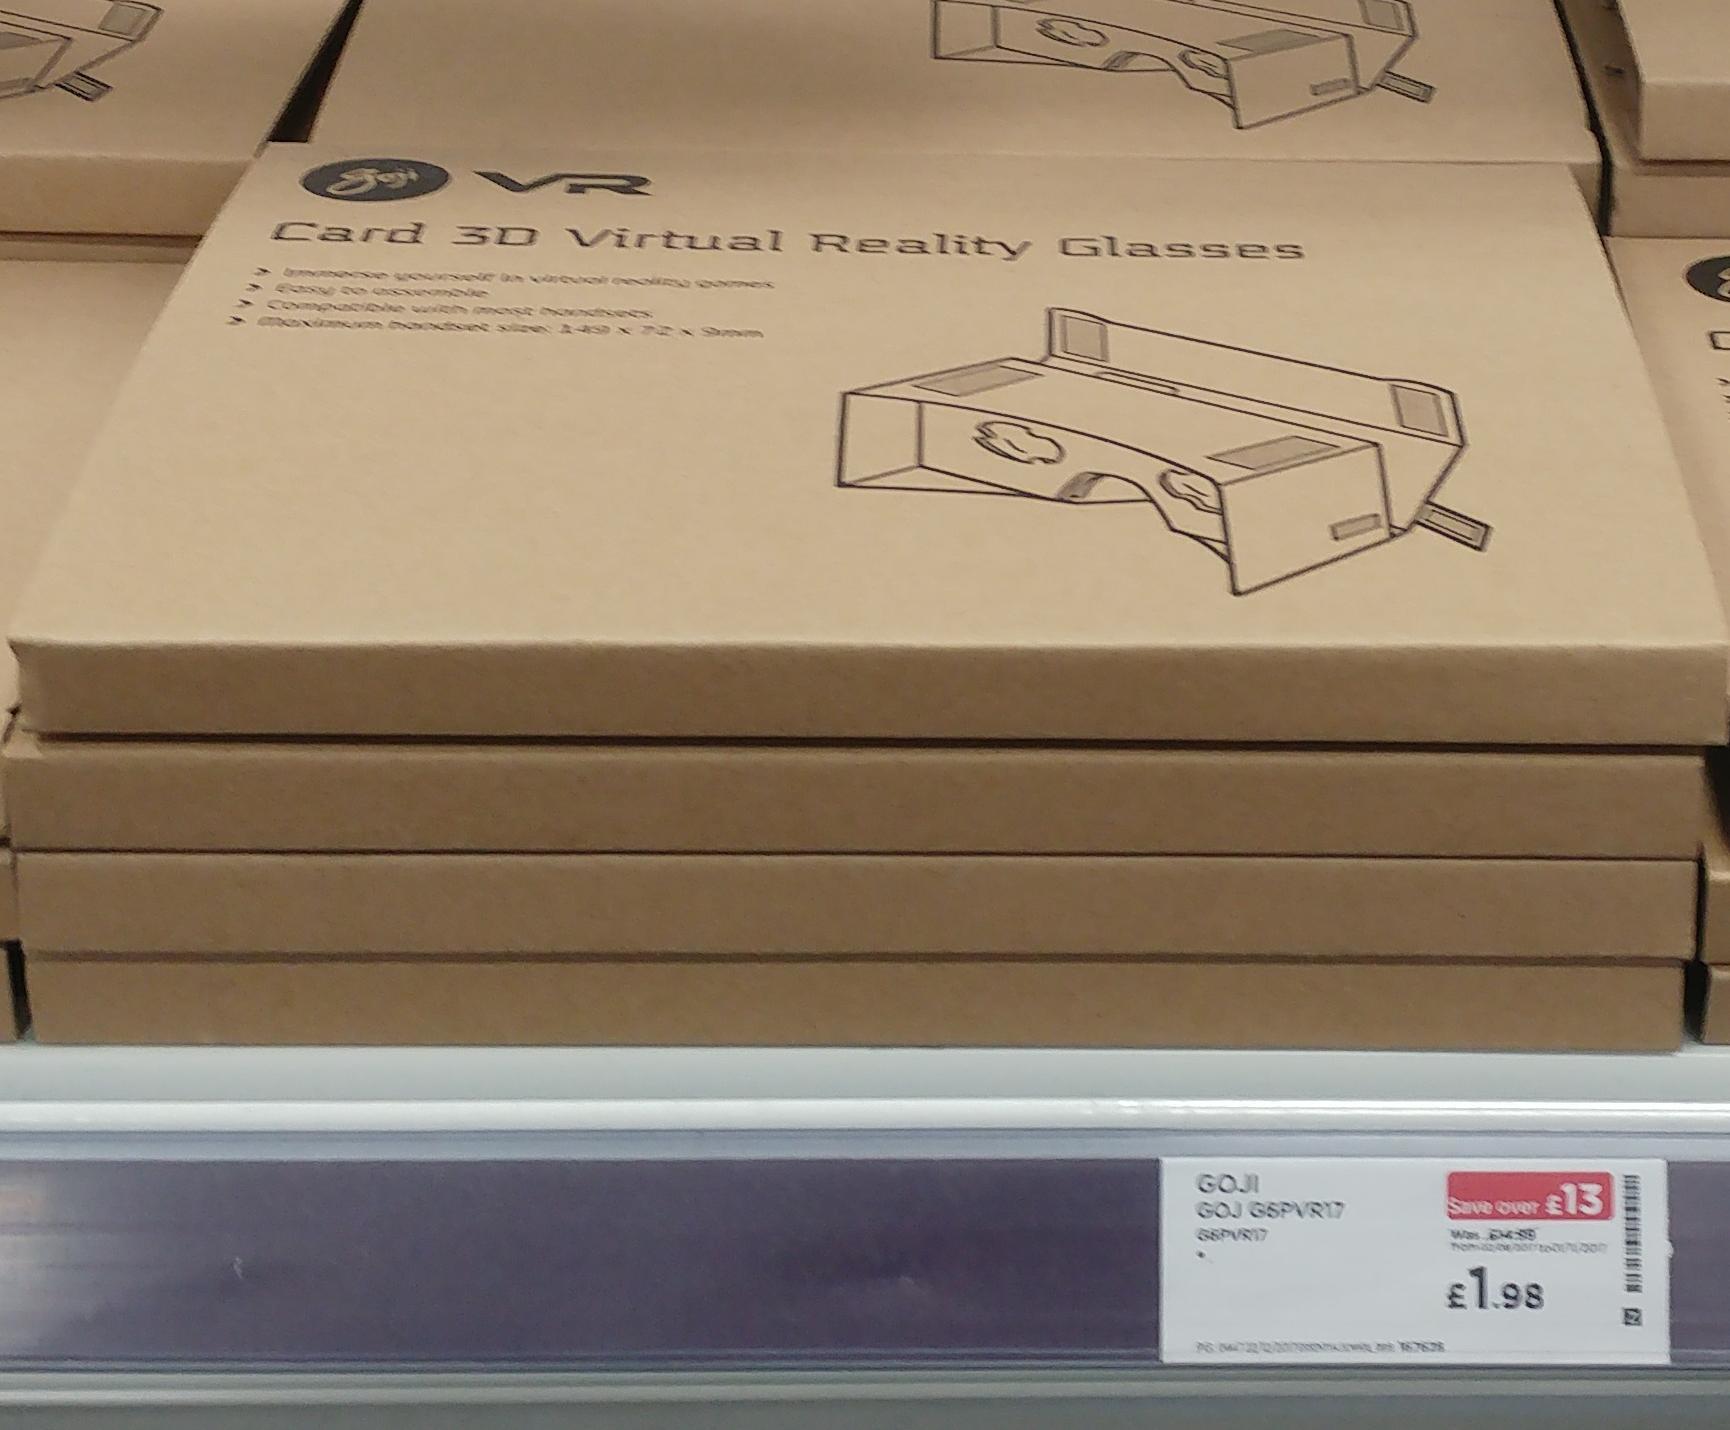 Goji Cardboard 3D Virtual Reality Glasses £0.97 instore @ PC World